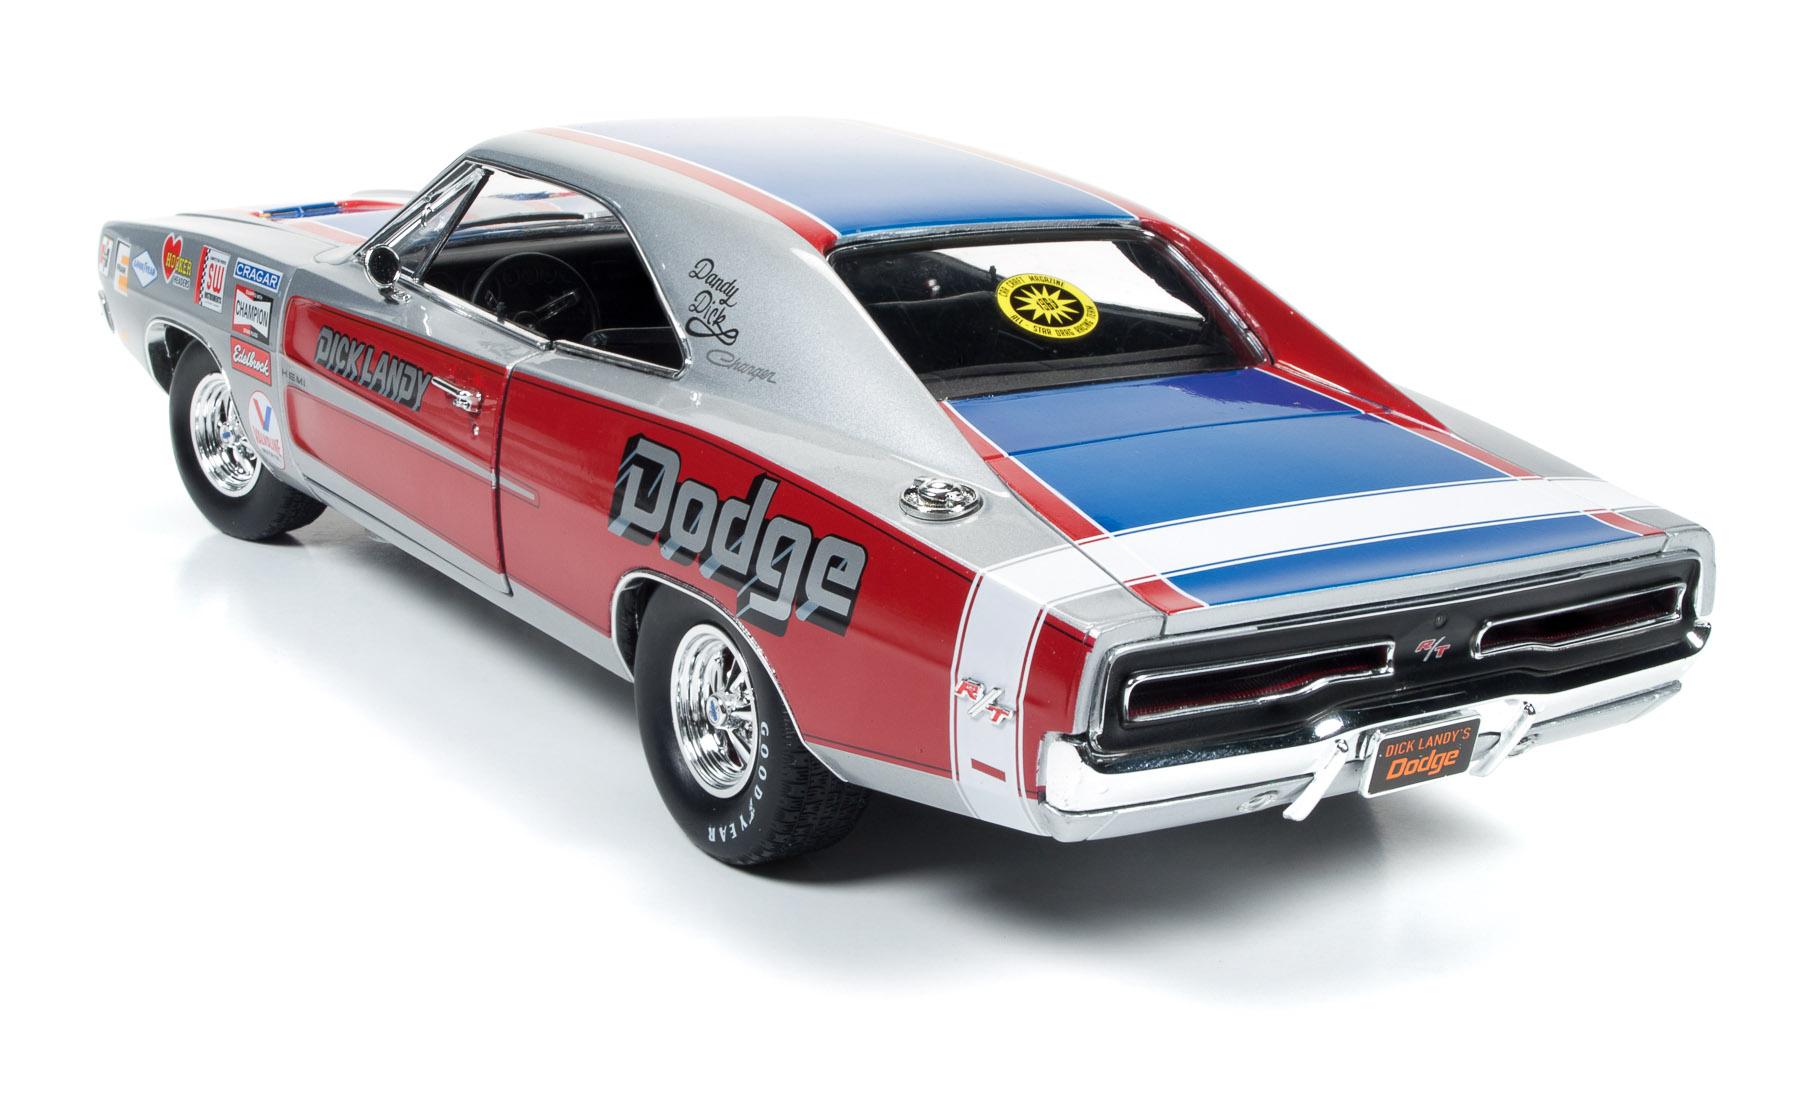 1969 Dodge Charger R T Model Racing Cars Hobbydb